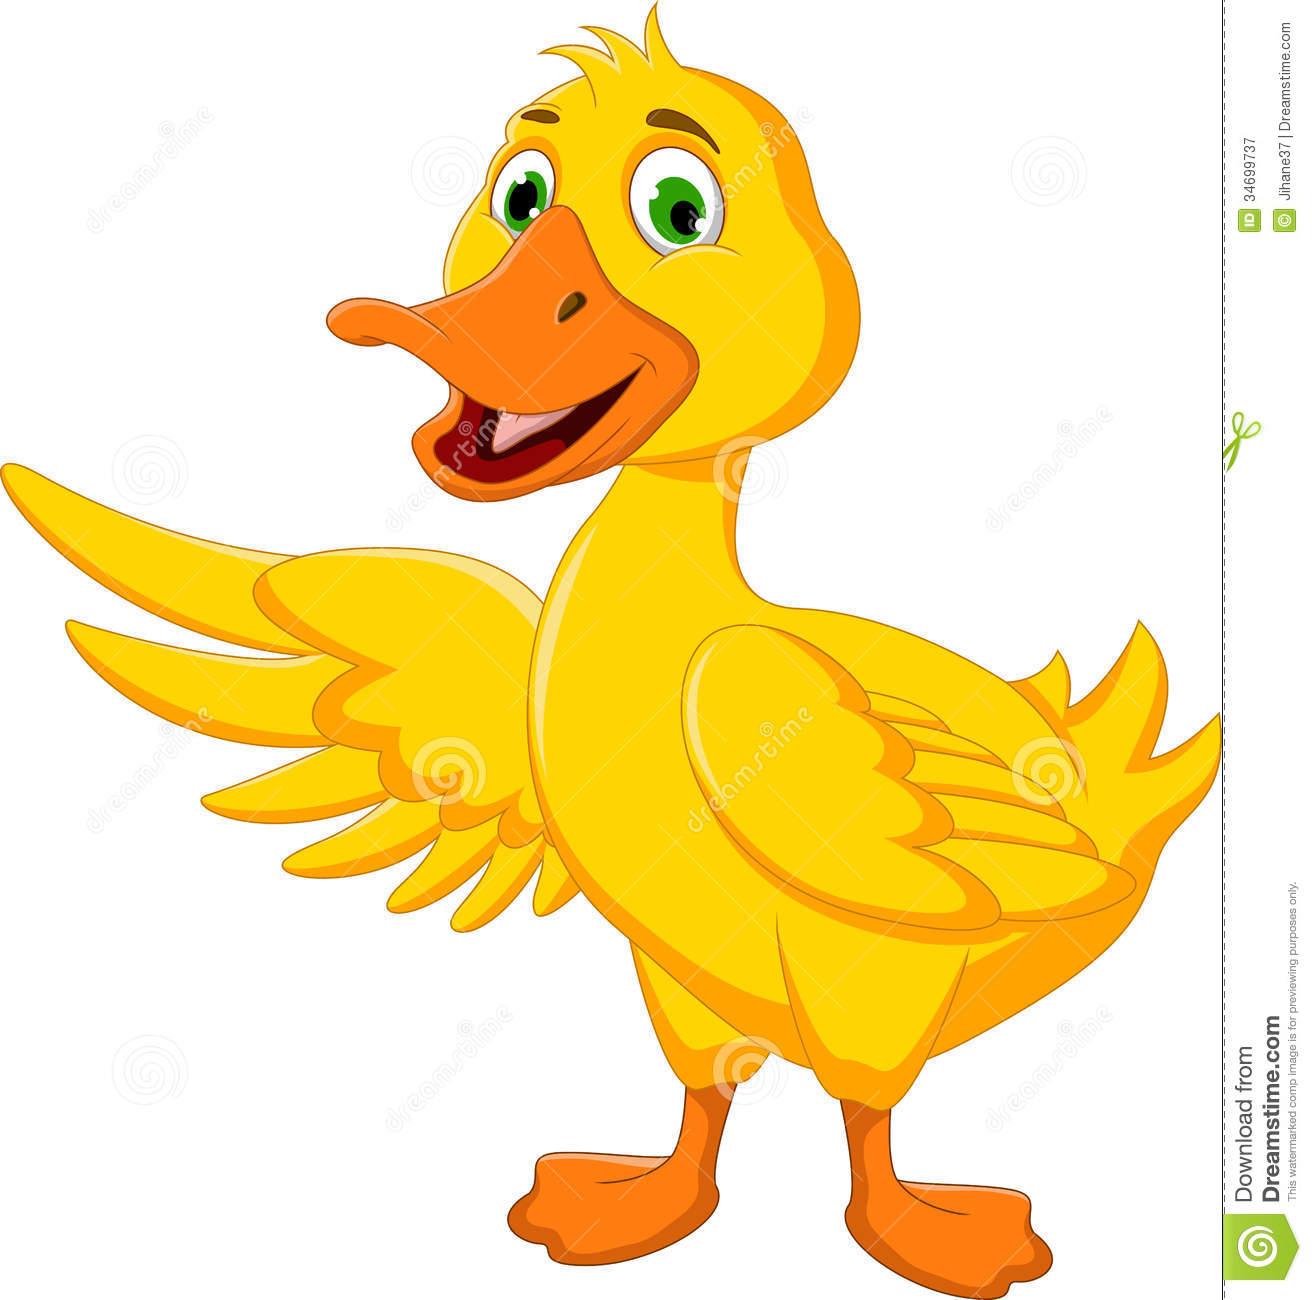 cute duck cartoon posing clipart panda free clipart images rh clipartpanda com mallard duck clipart free mallard duck clipart free